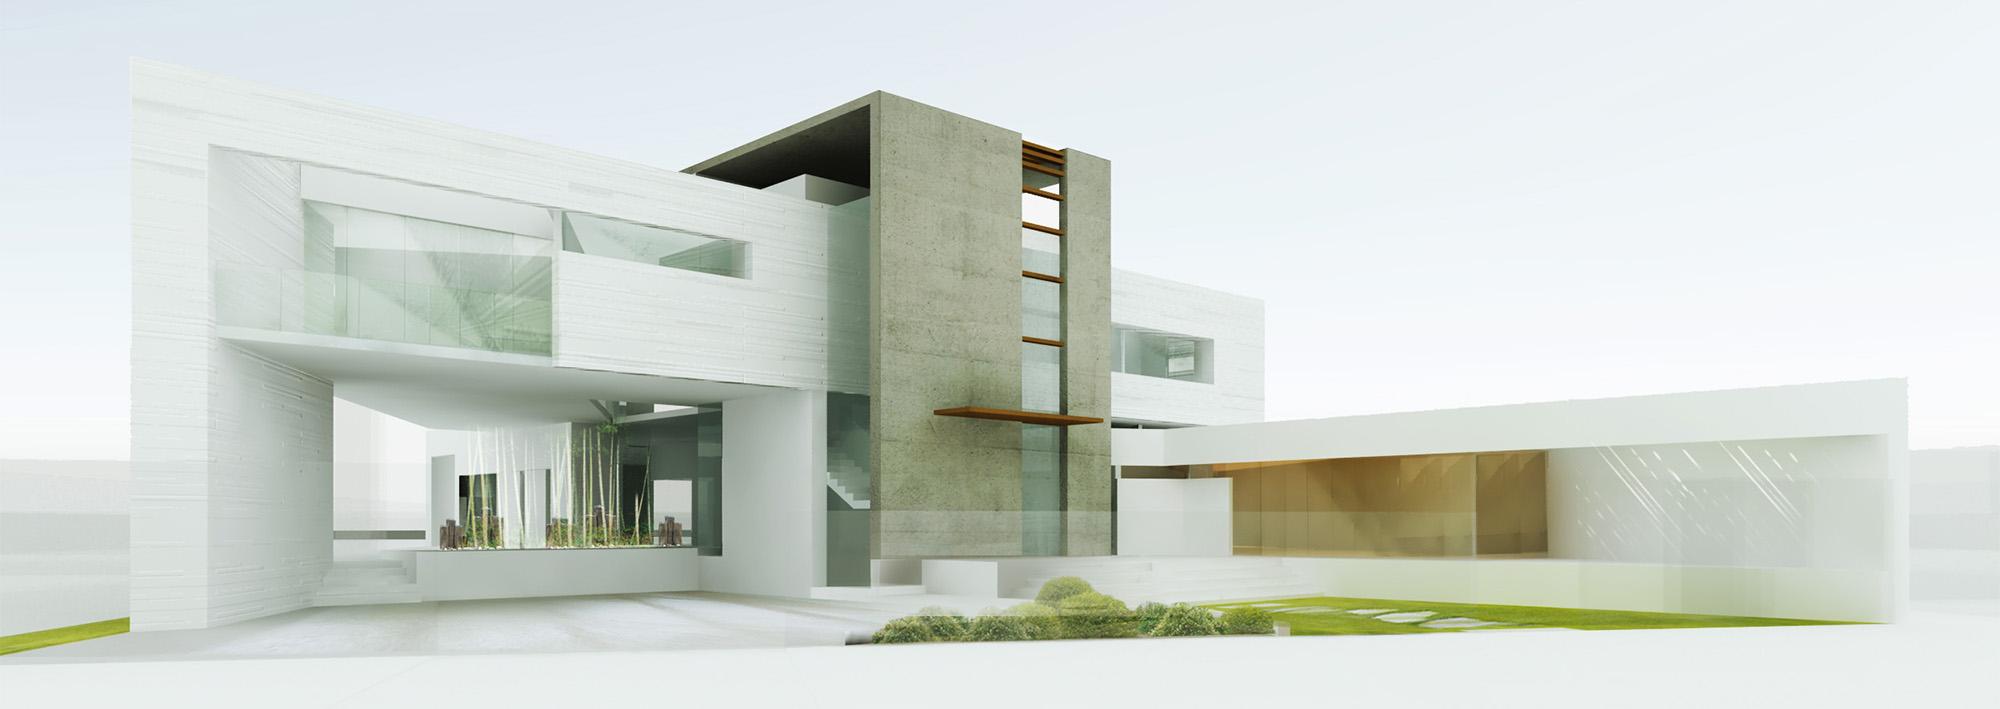 BEAD Contemporary villa street view.JPG